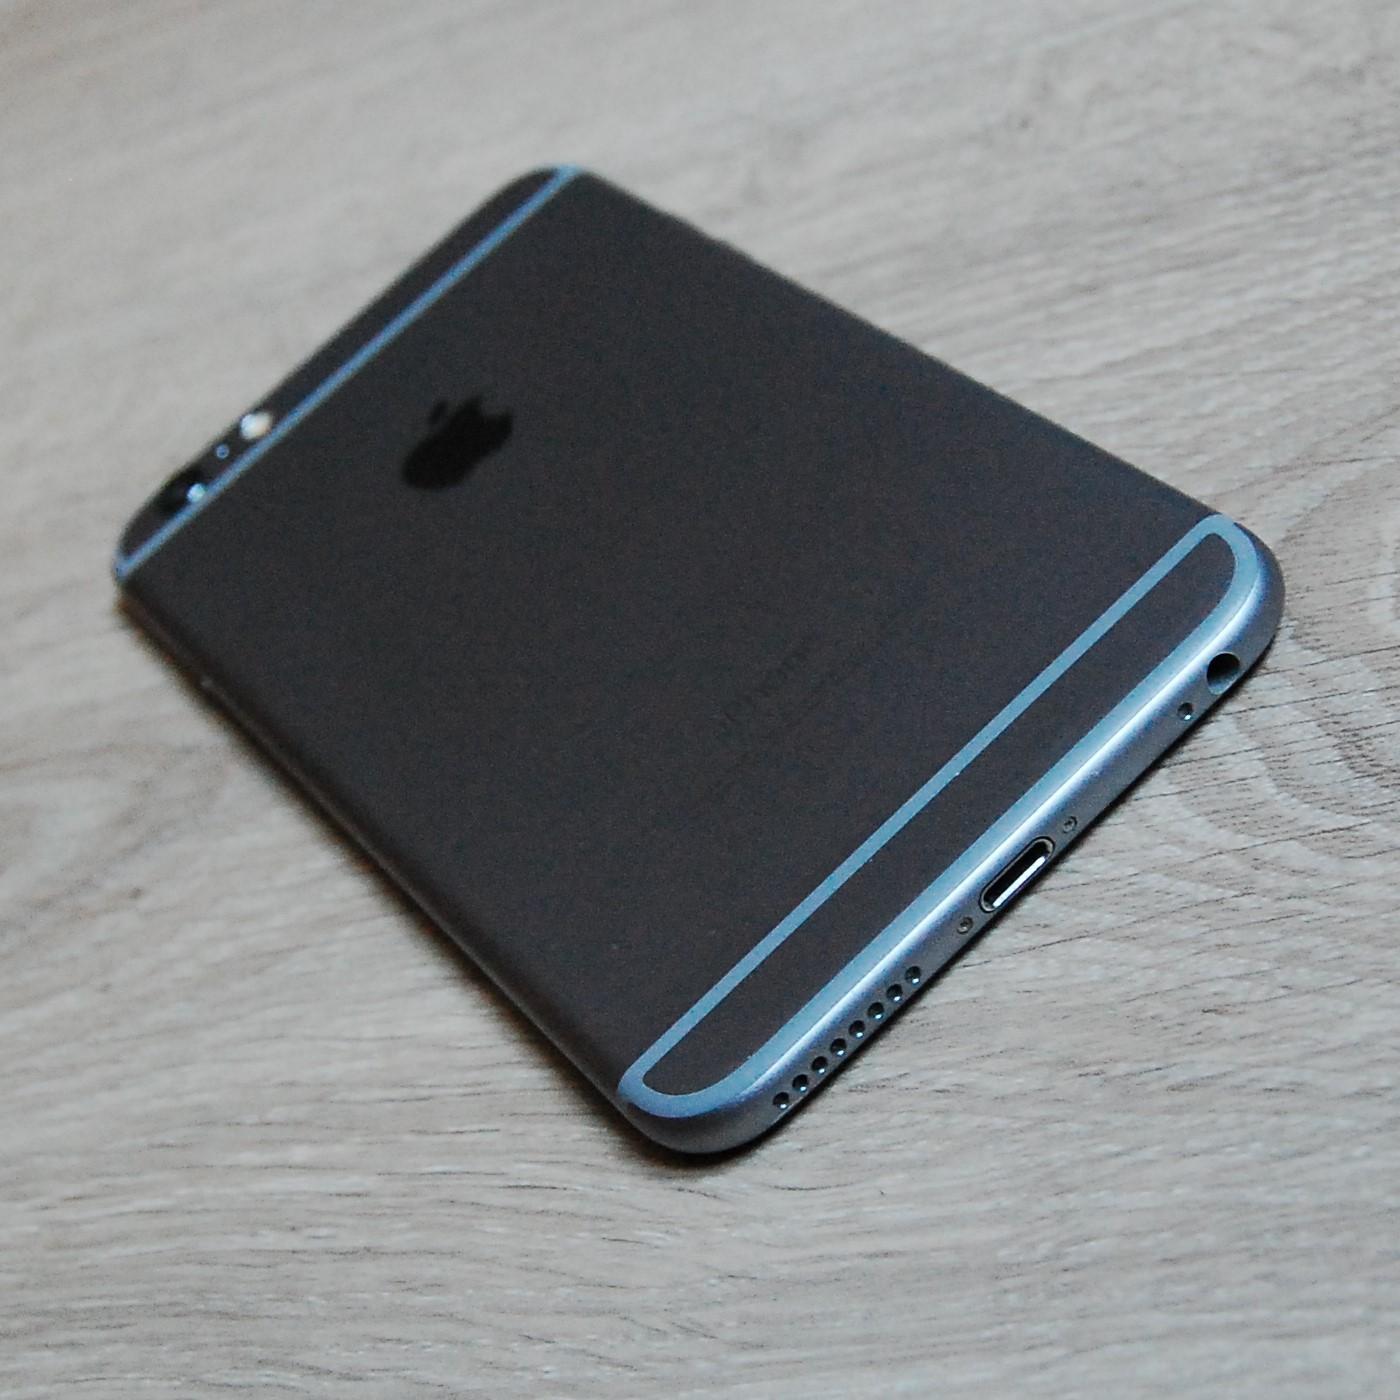 venta iphone 6 plus 16 gb gris espacial venta segunda mano apple. Black Bedroom Furniture Sets. Home Design Ideas